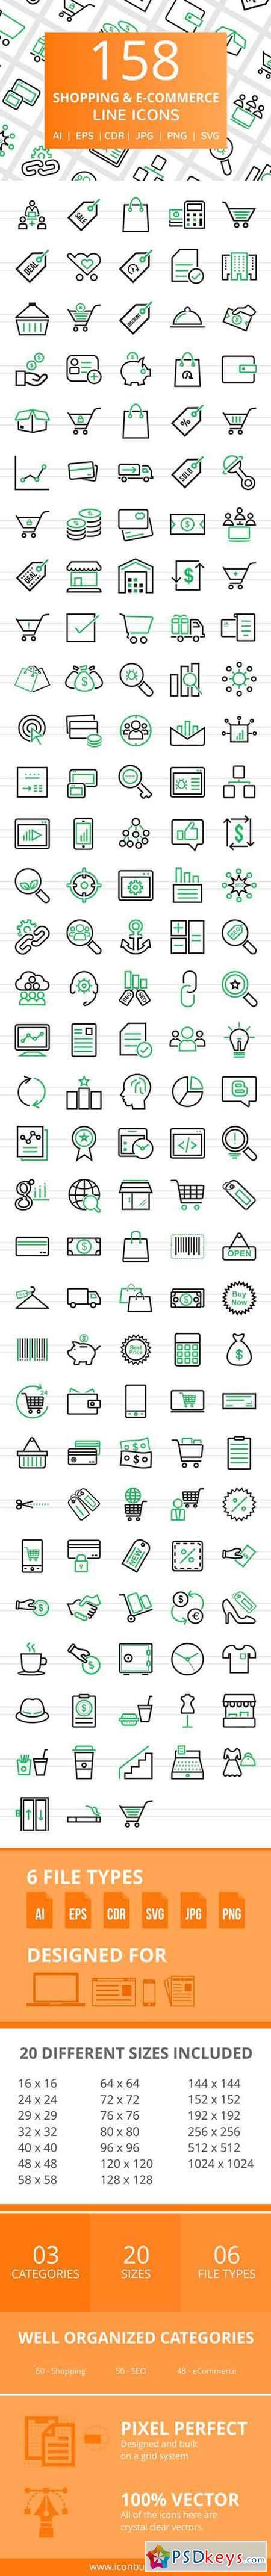 158 Shopping & E-Commerce Line Icons 2456439